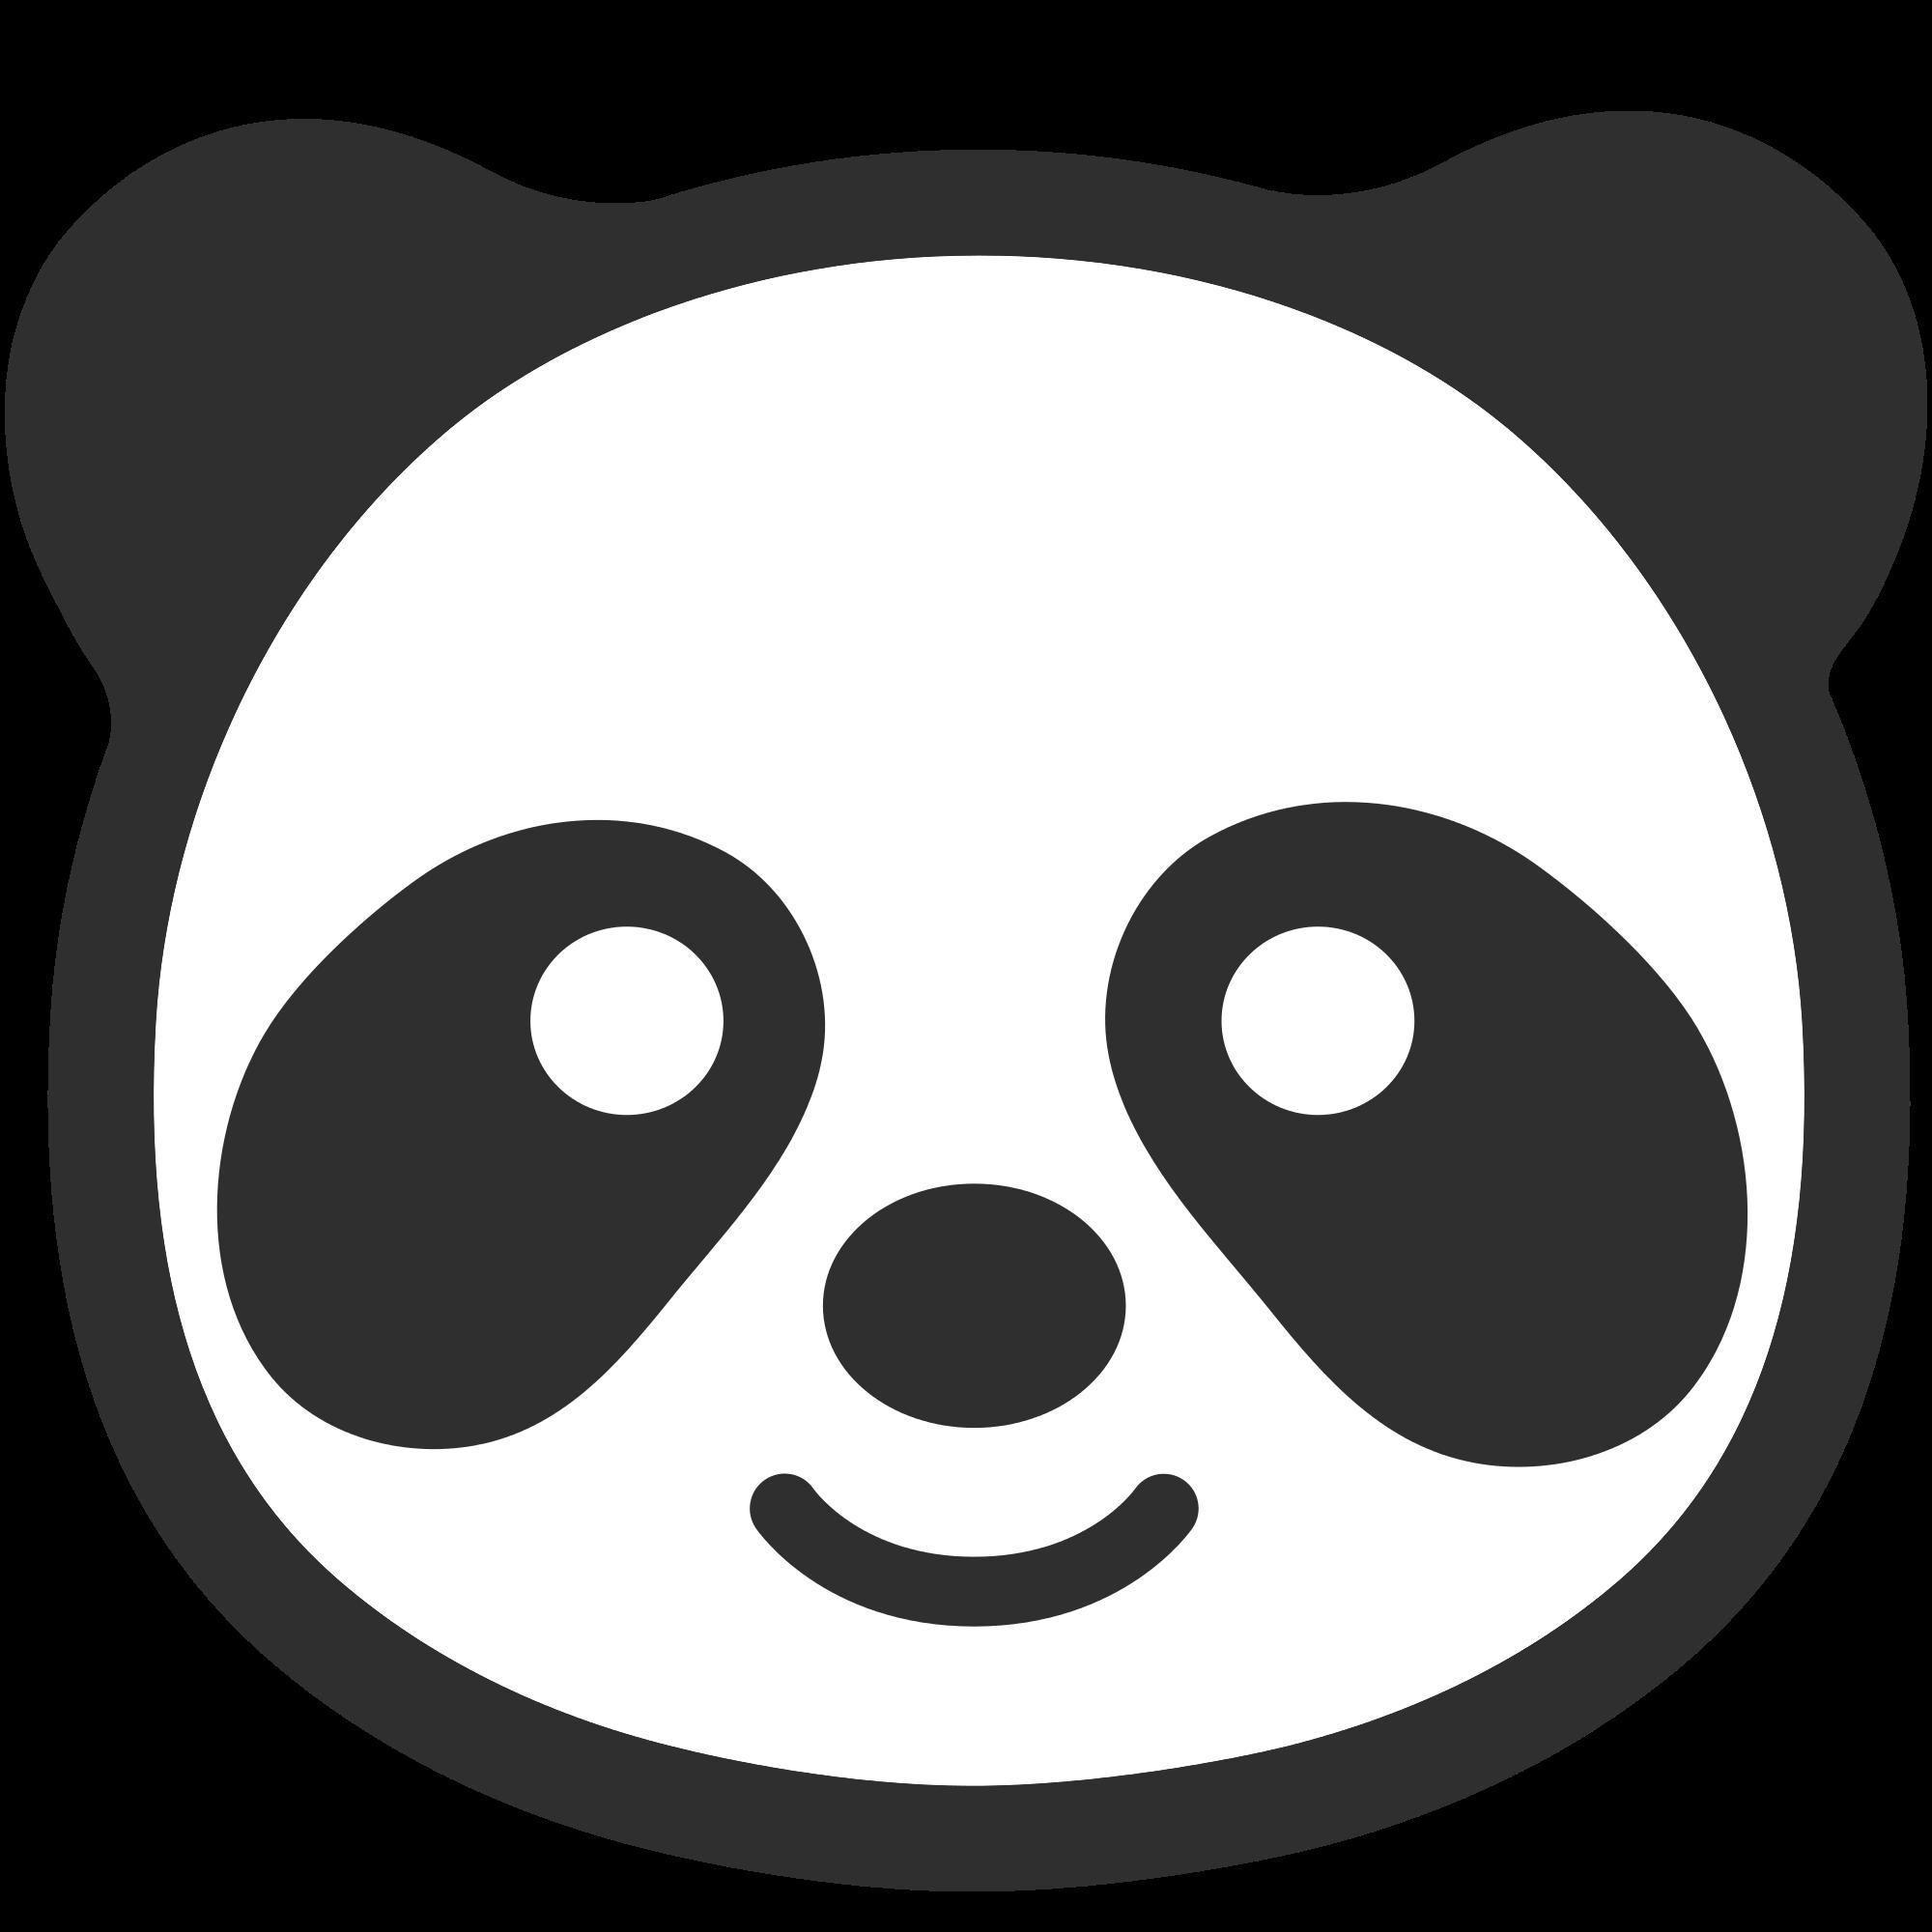 Emoji Panda transparent PNG.